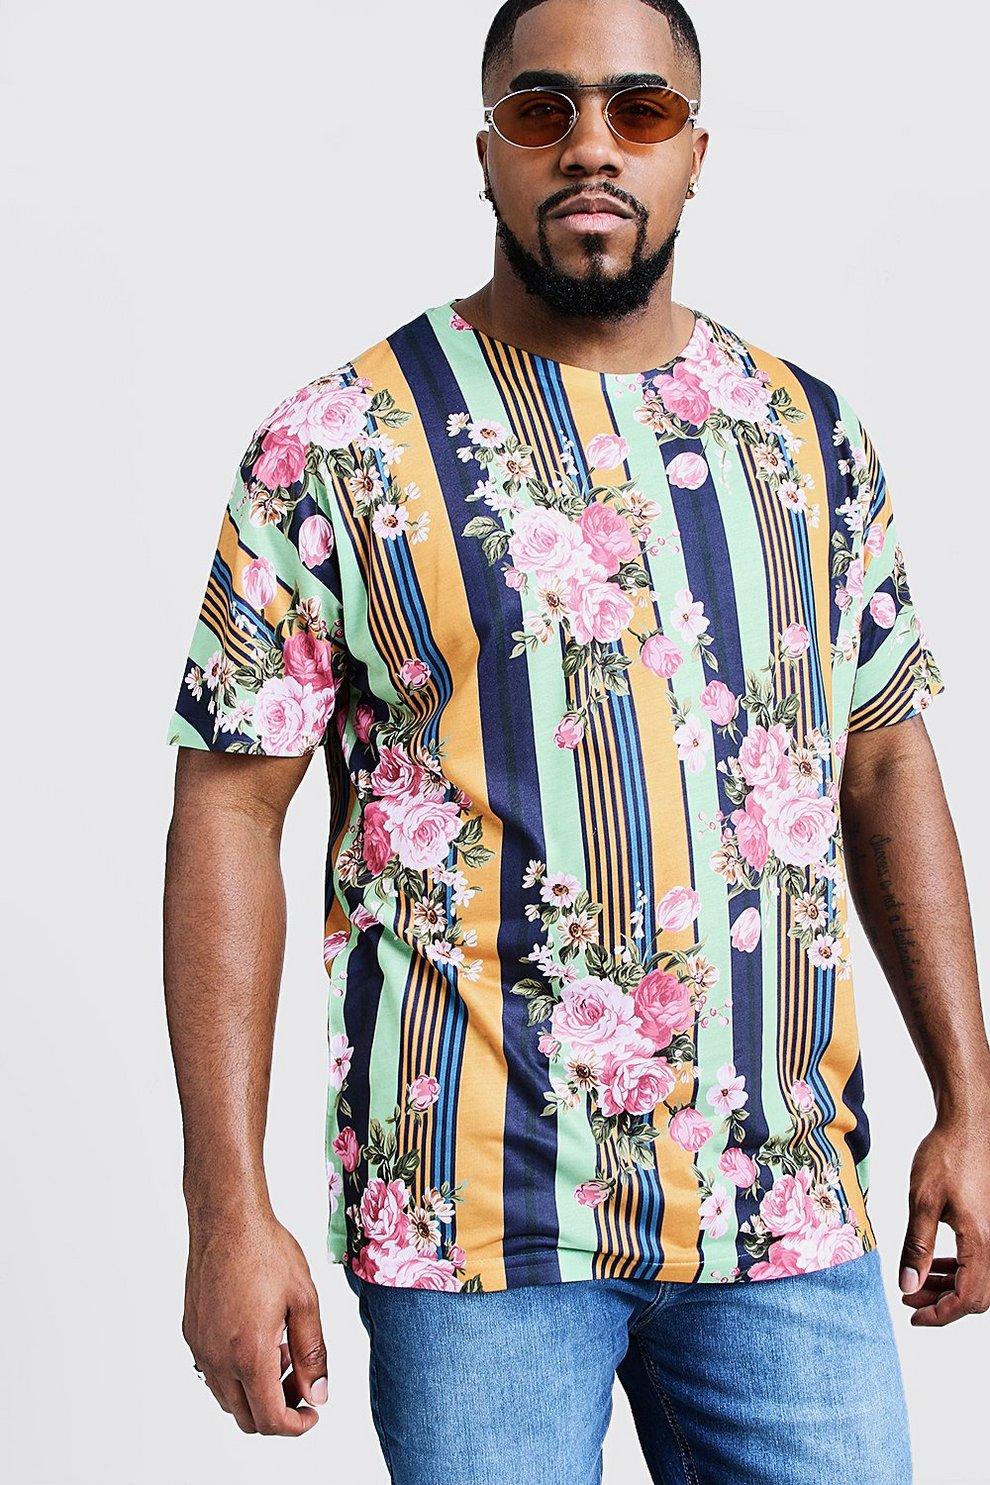 af6360720e Big & Tall Vertical Stripe / Floral Print Jersey Tee   Boohoo